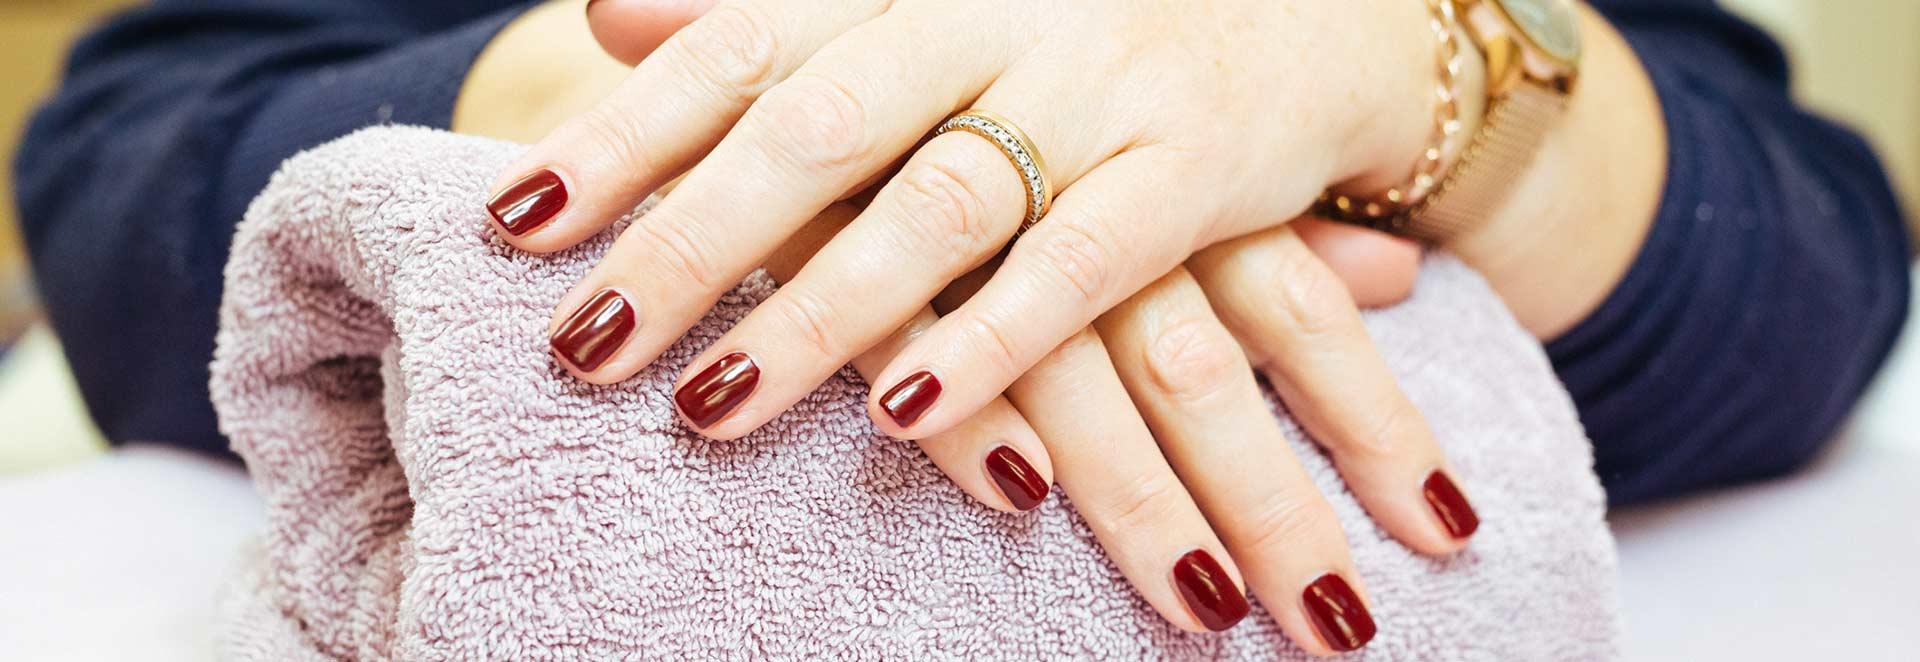 Neu: Manicure mit Shellack